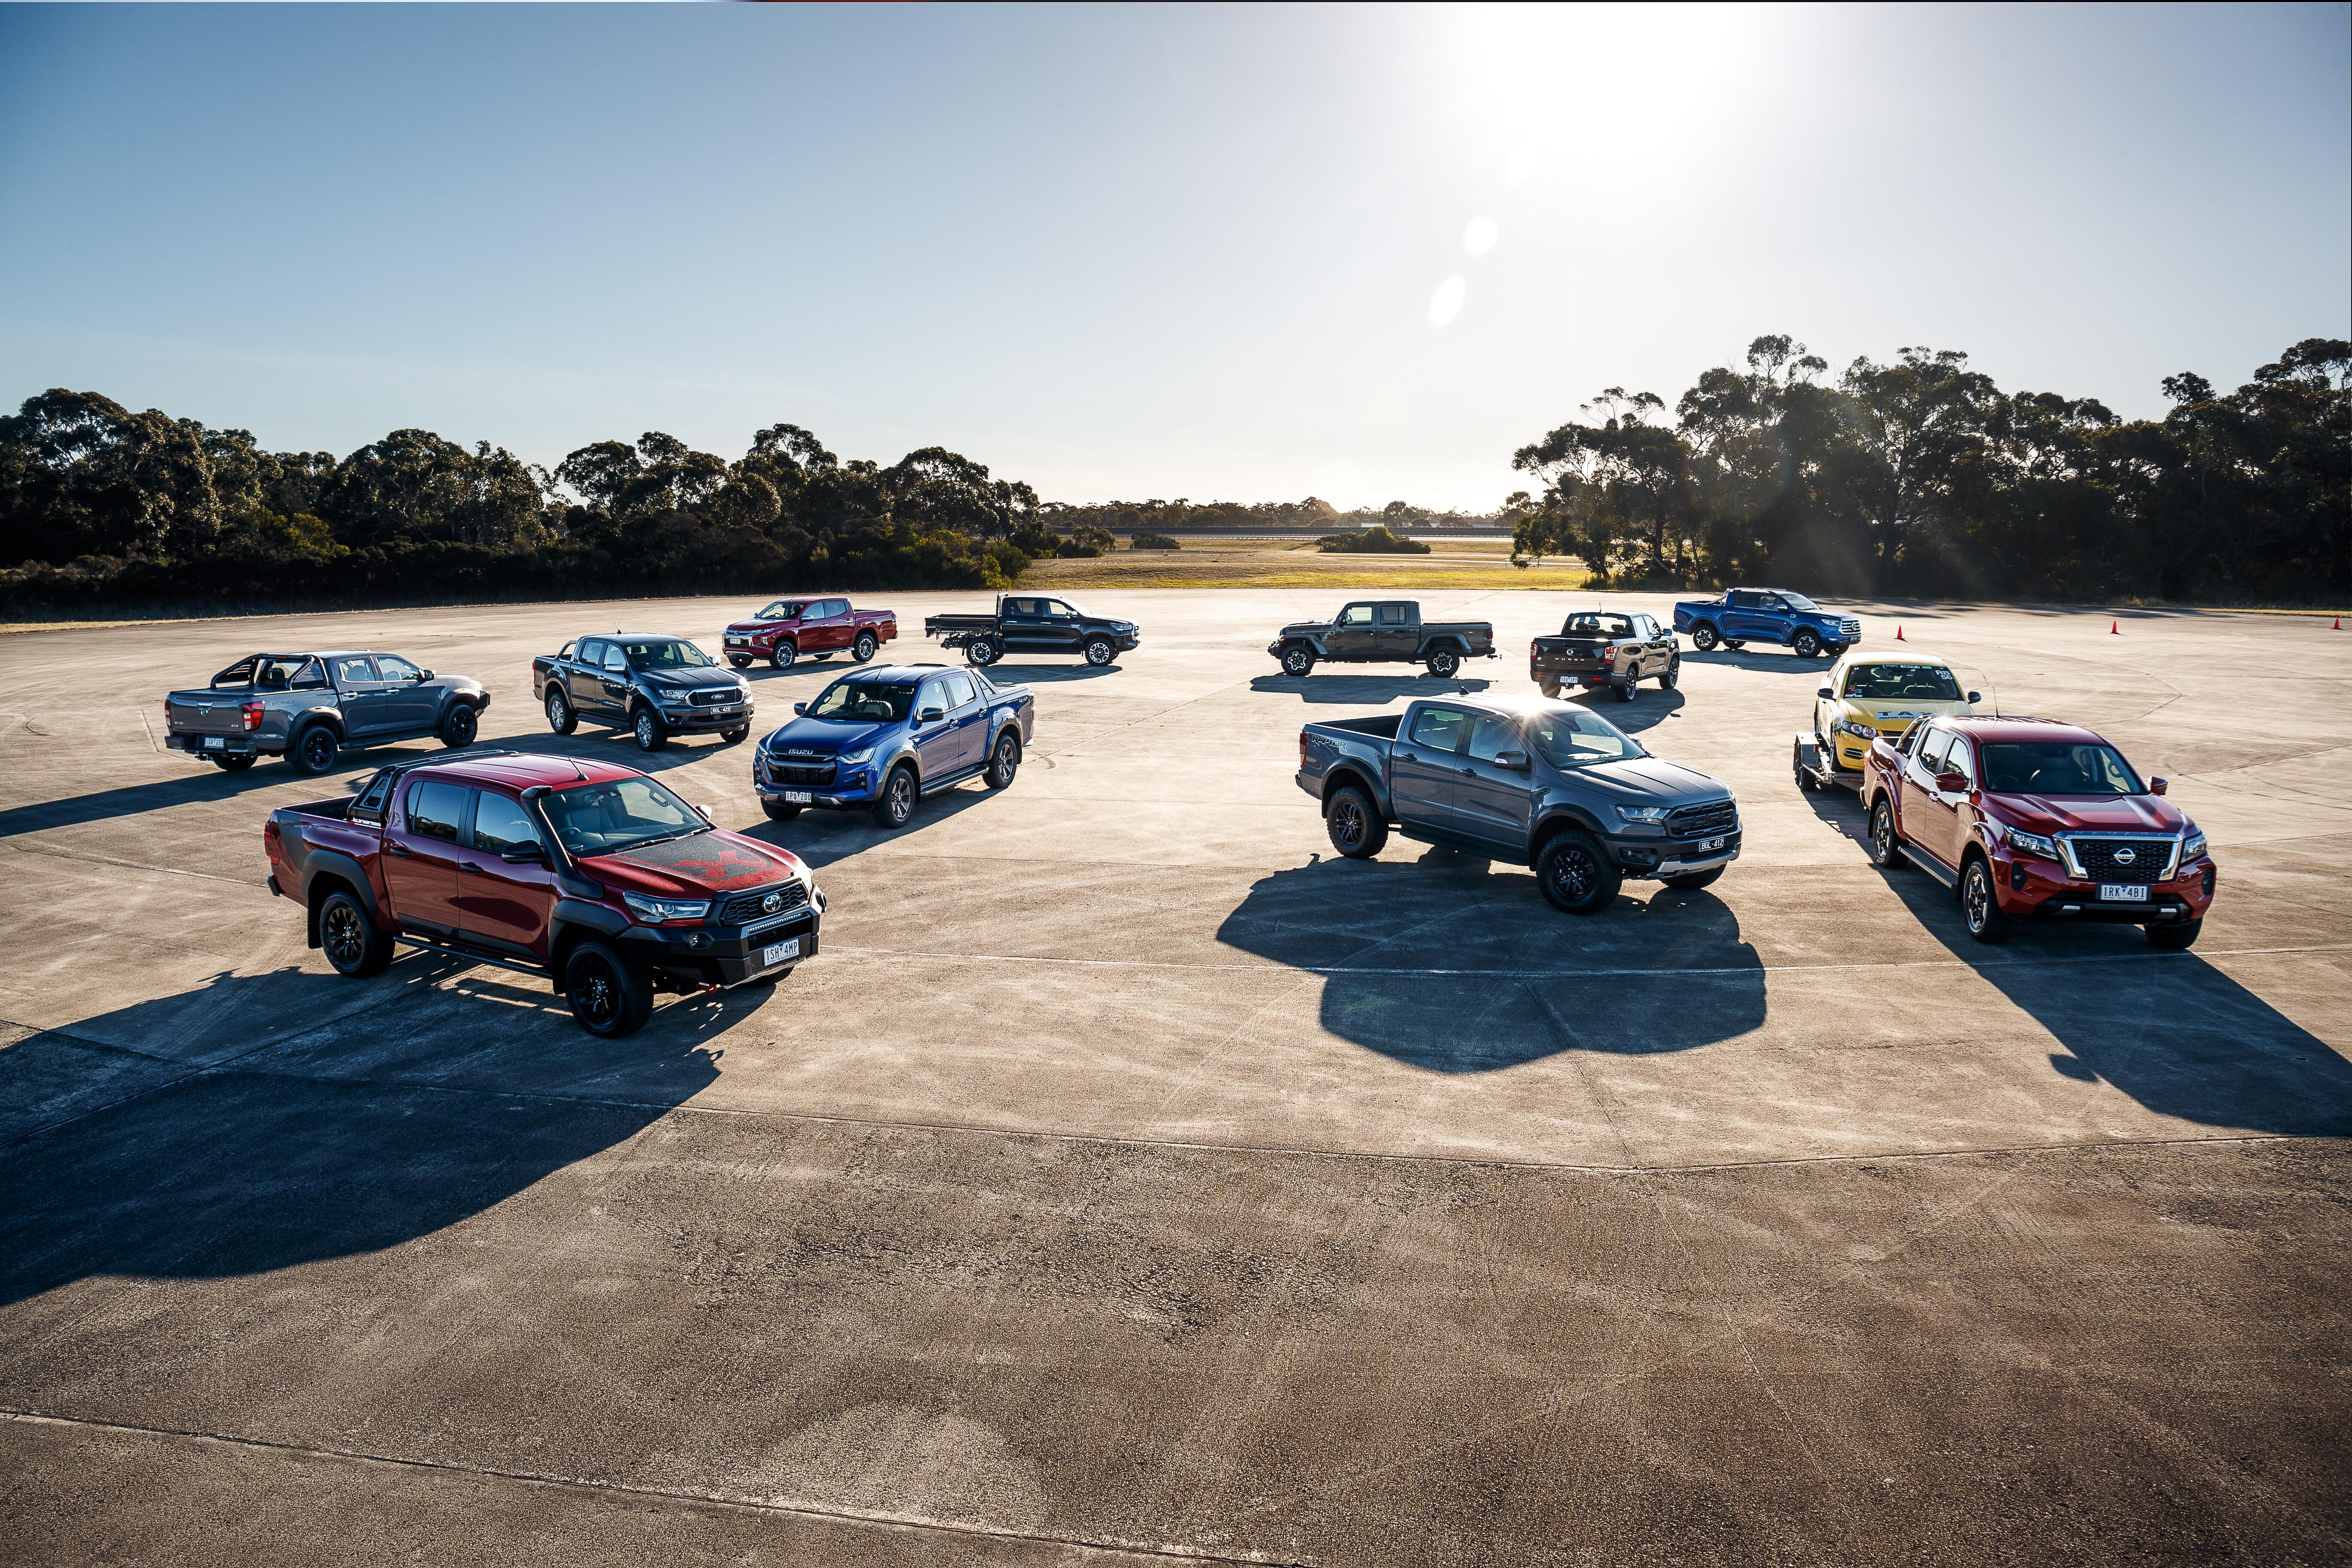 4 X 4 Australia Comparisons 2021 May 21 2021 Dual Cab Ute Mega Test Off Road Comparison Group Shot